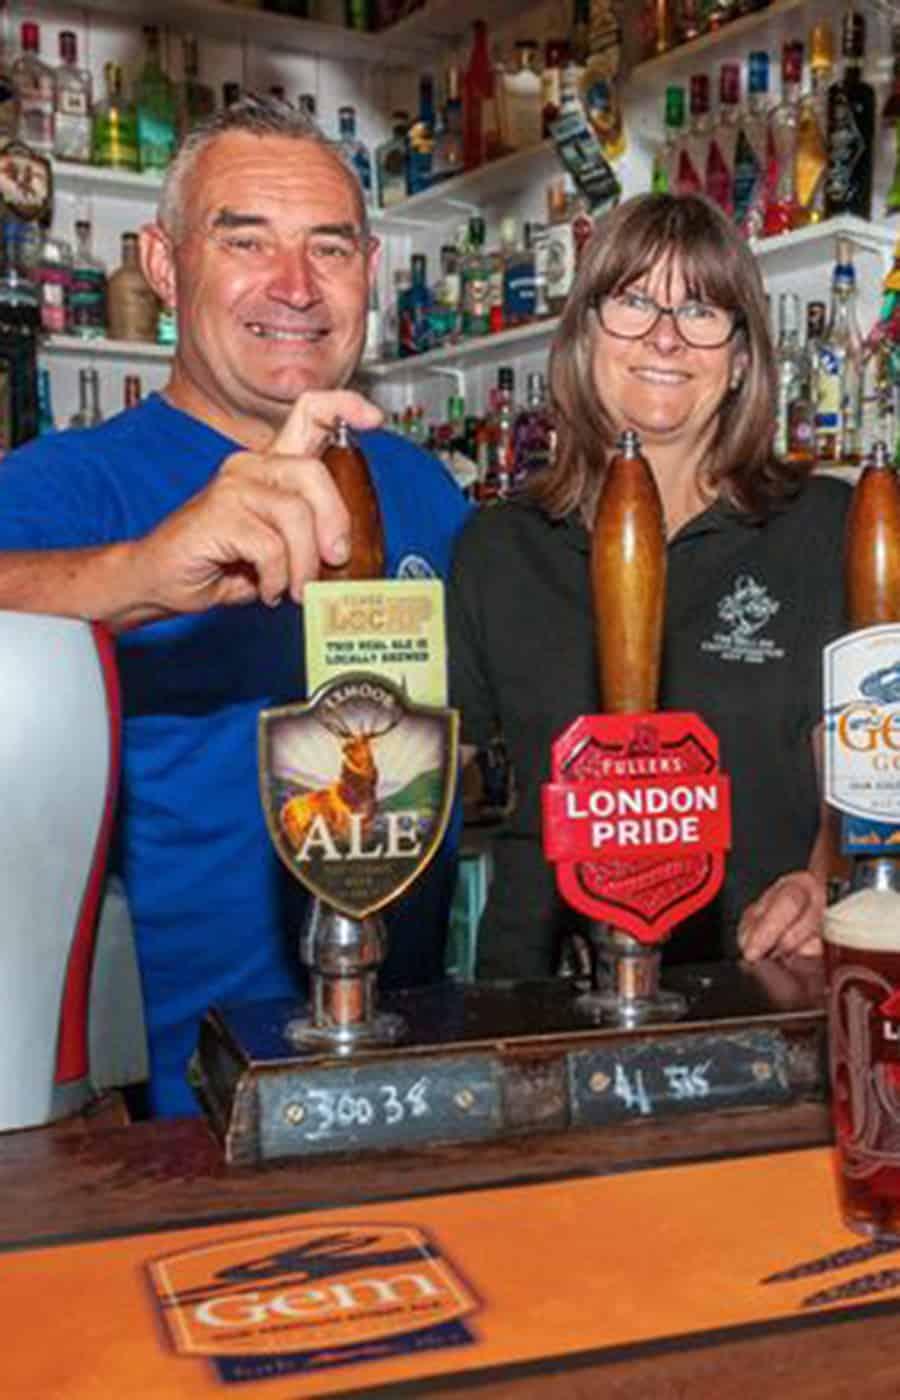 Mark & Lyn Jones of The Bell Chittlehampton